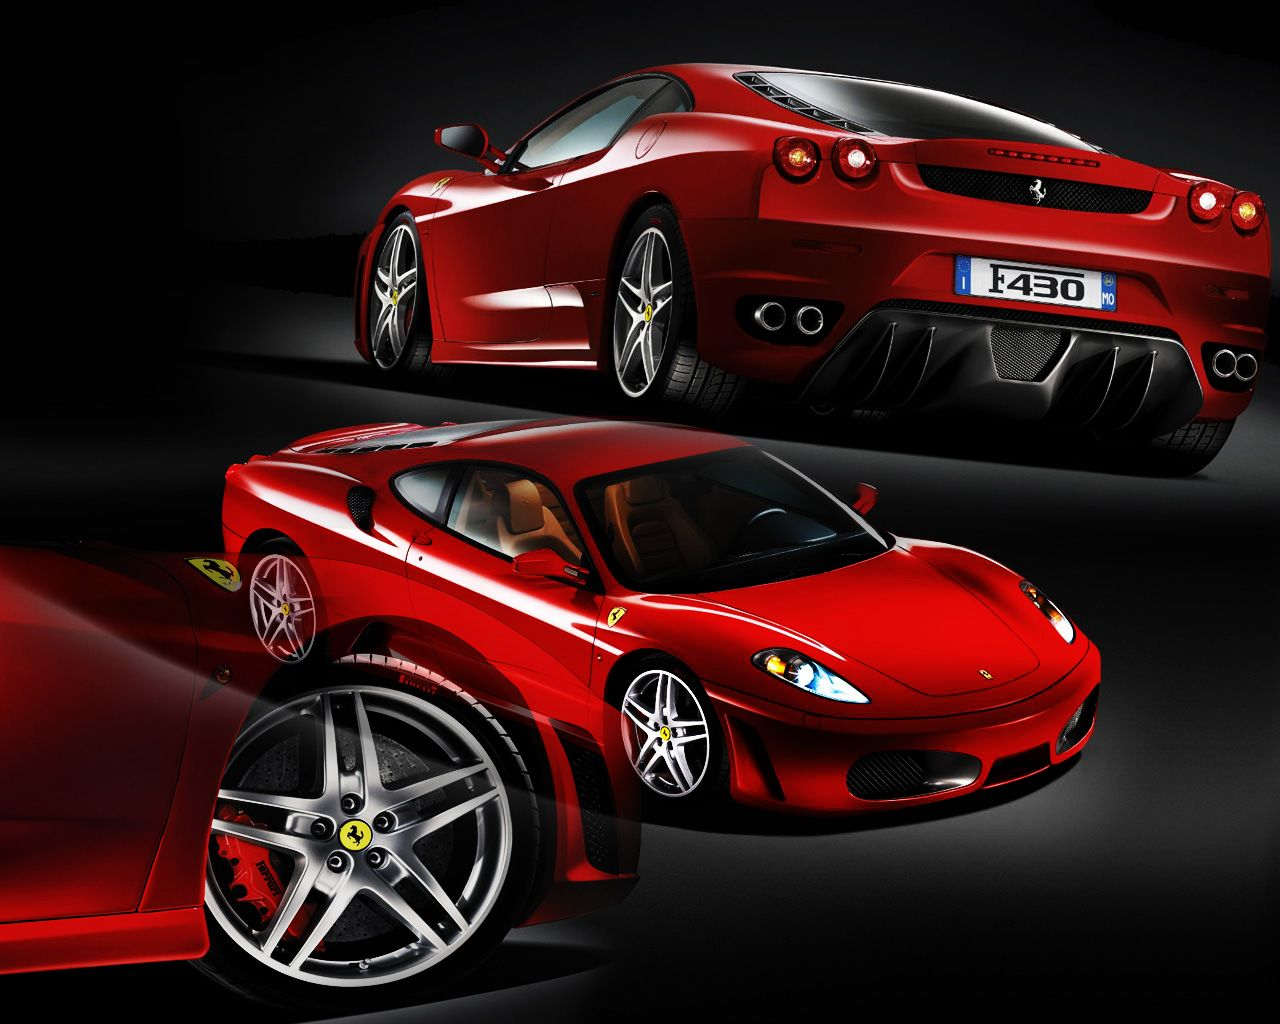 Ferrari Ferrari Wallpaper Ferrari Car Ferrari